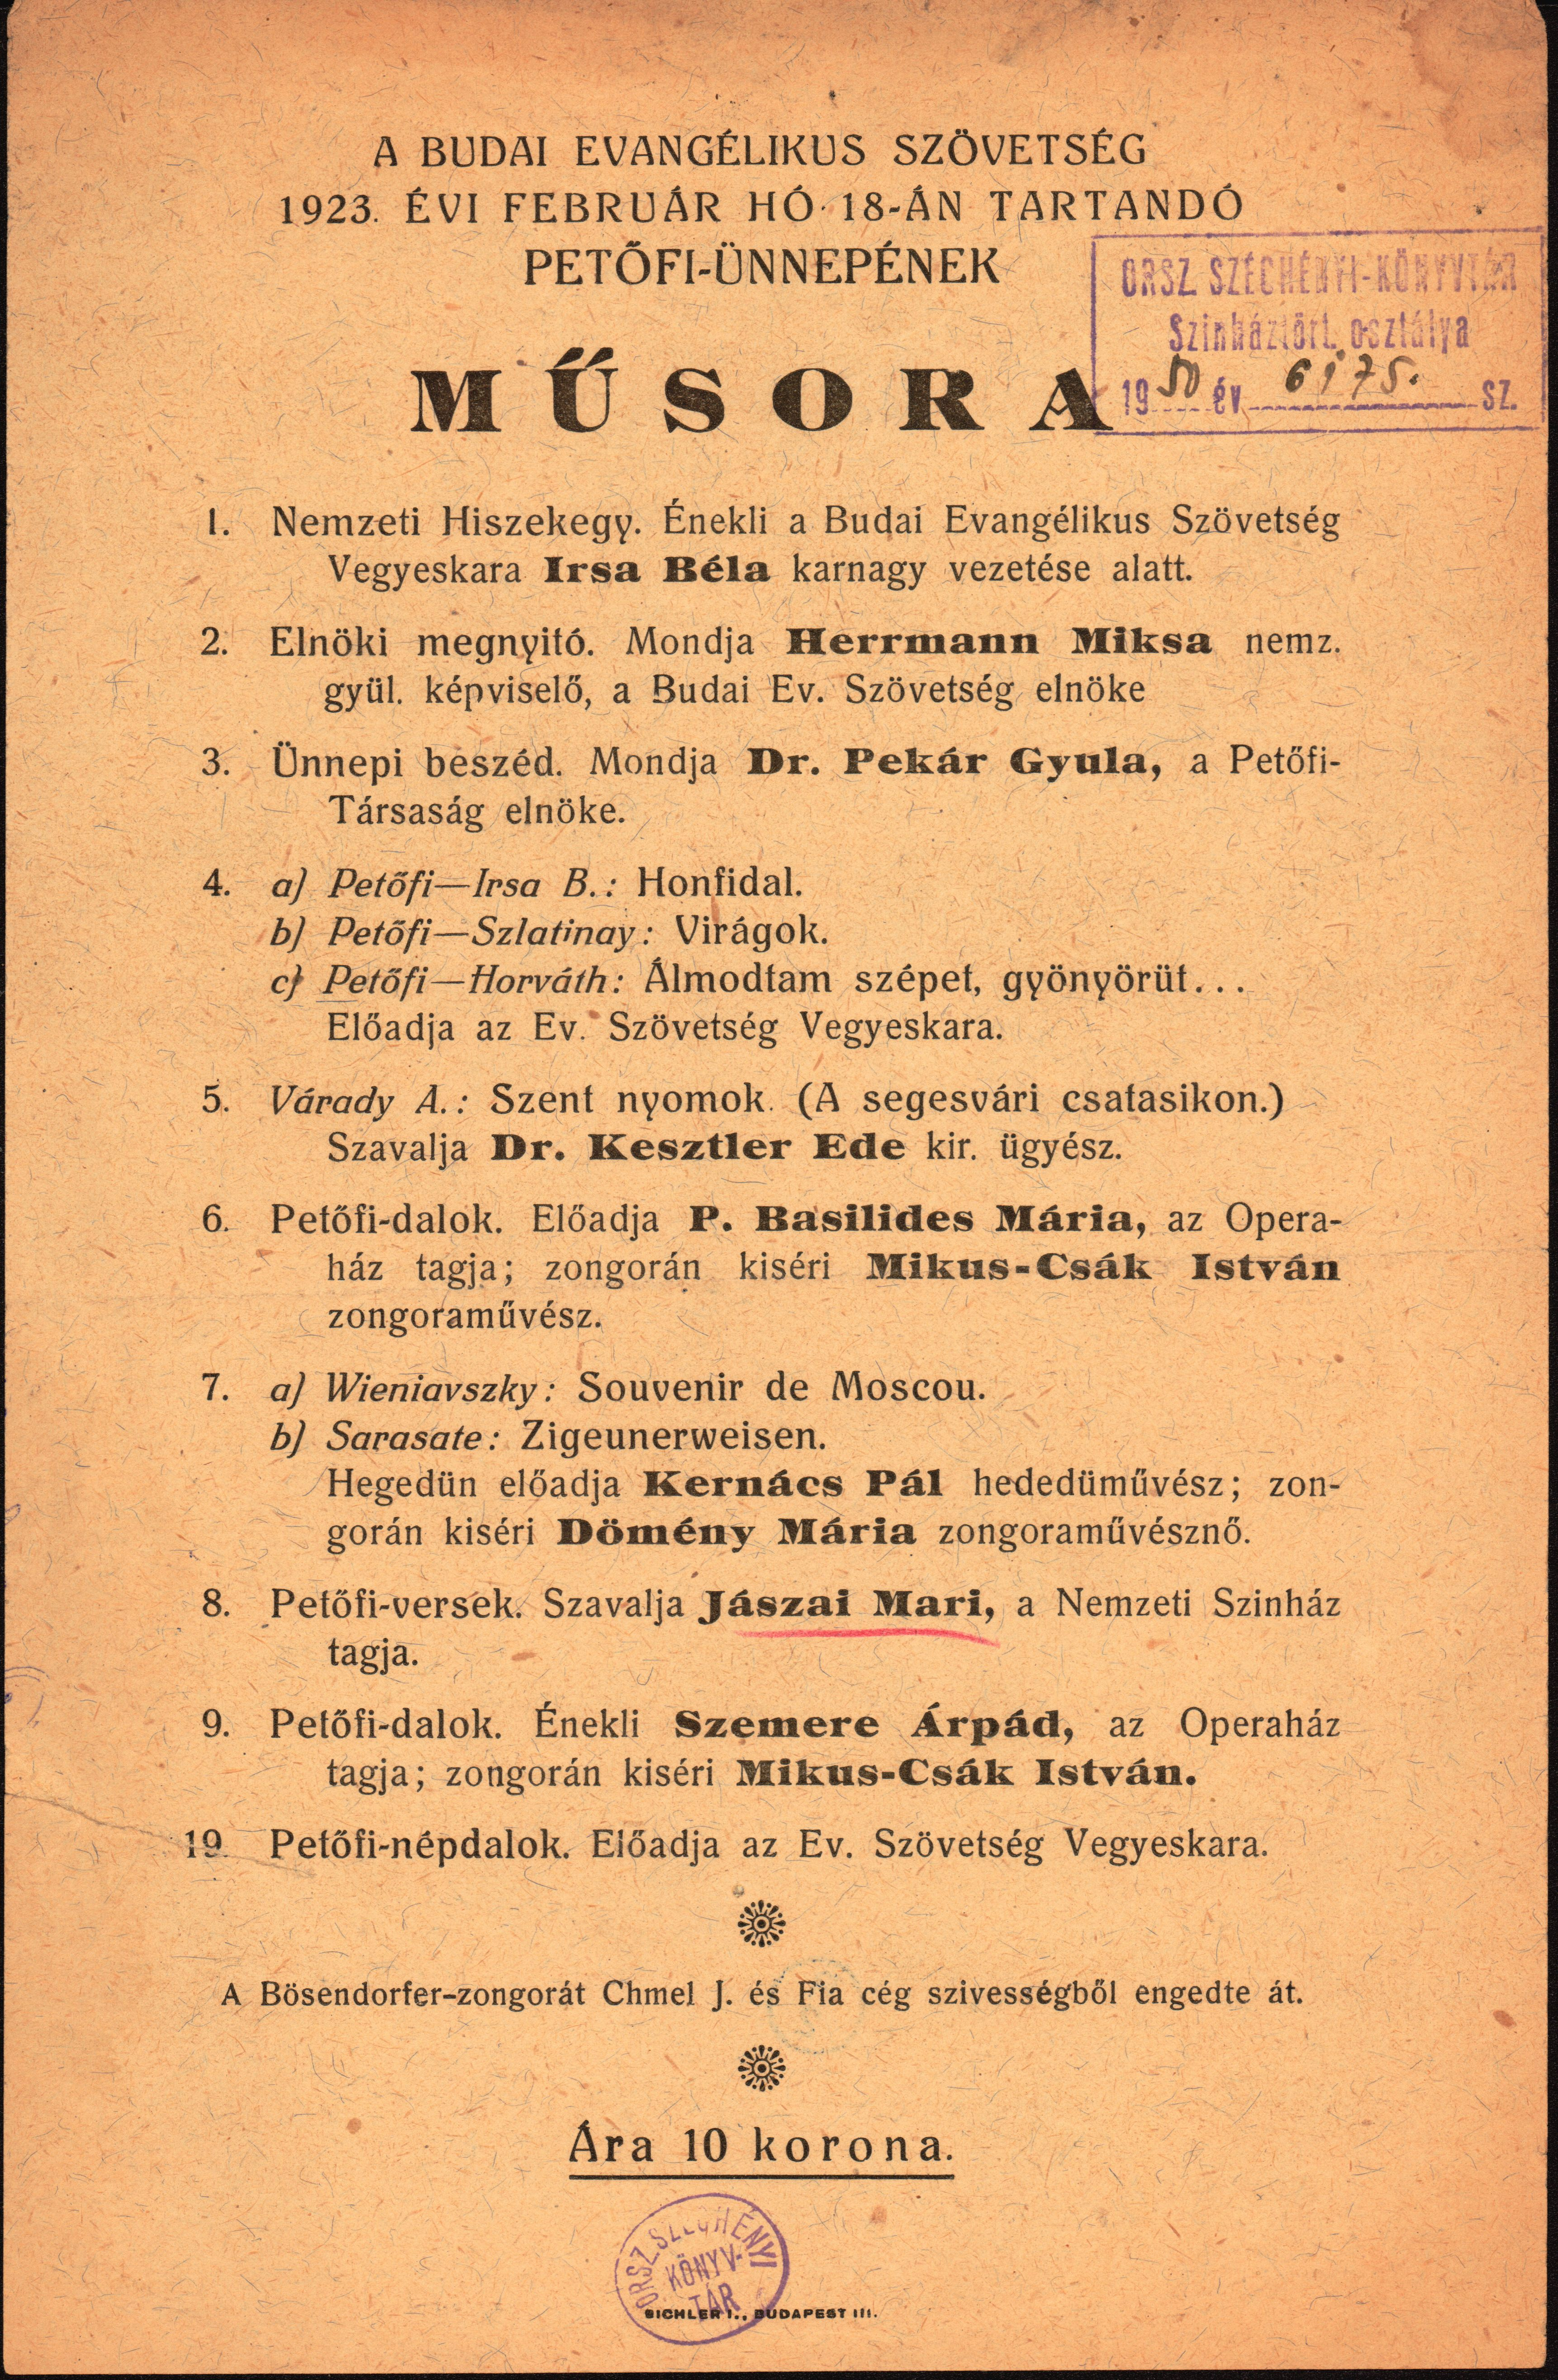 A Budai Evangélikus Szövetség Petőfi-ünnepének 1923-as szórólapja